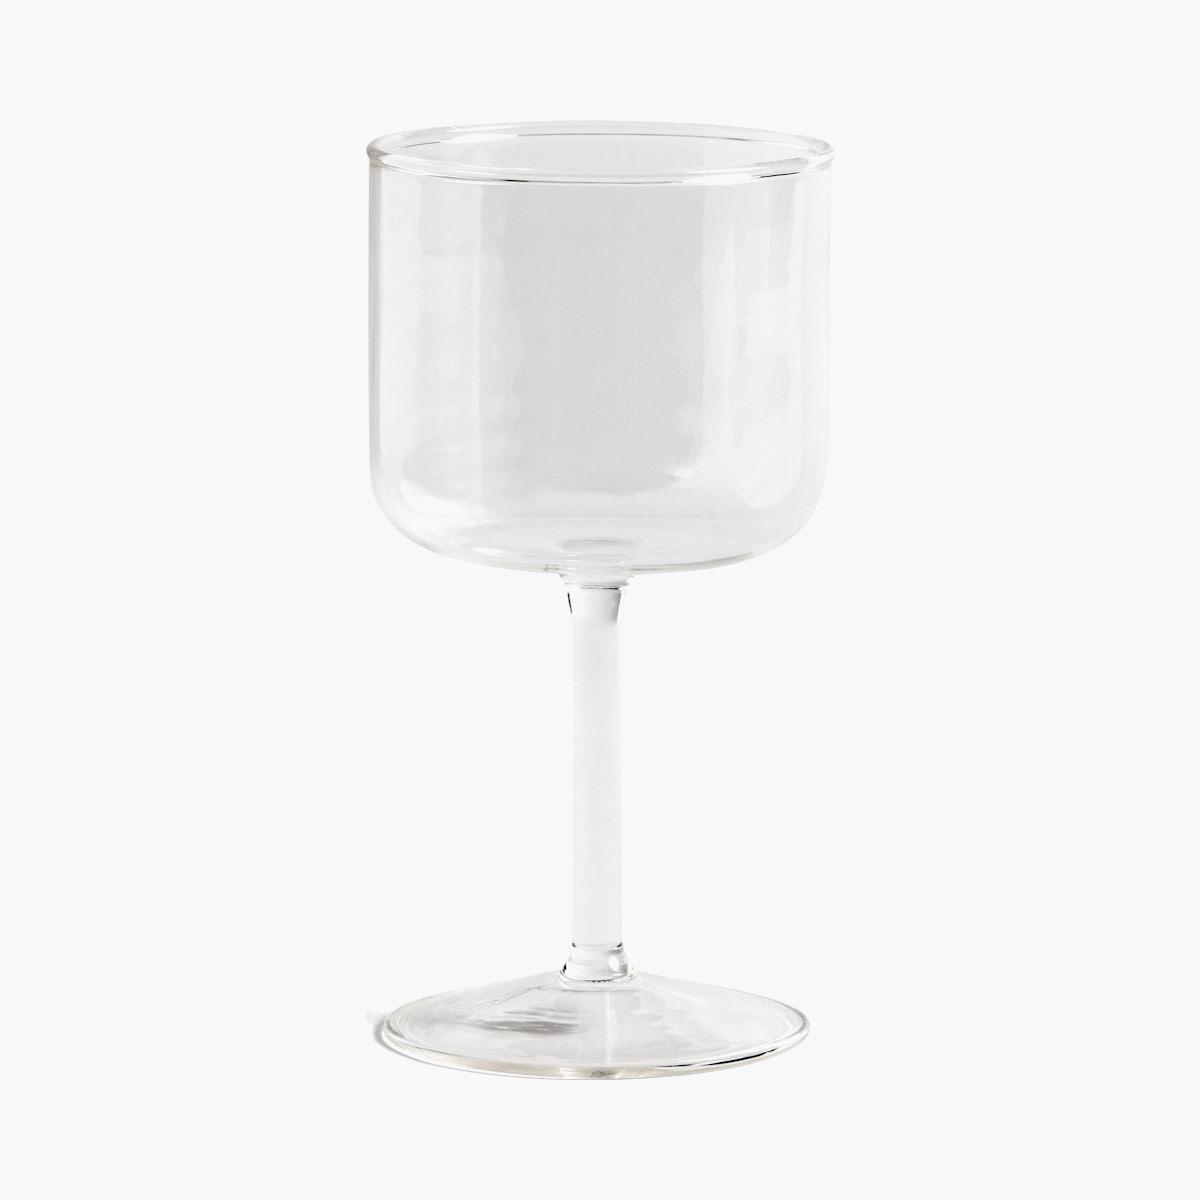 Tint Wine Glasses, Set of 2